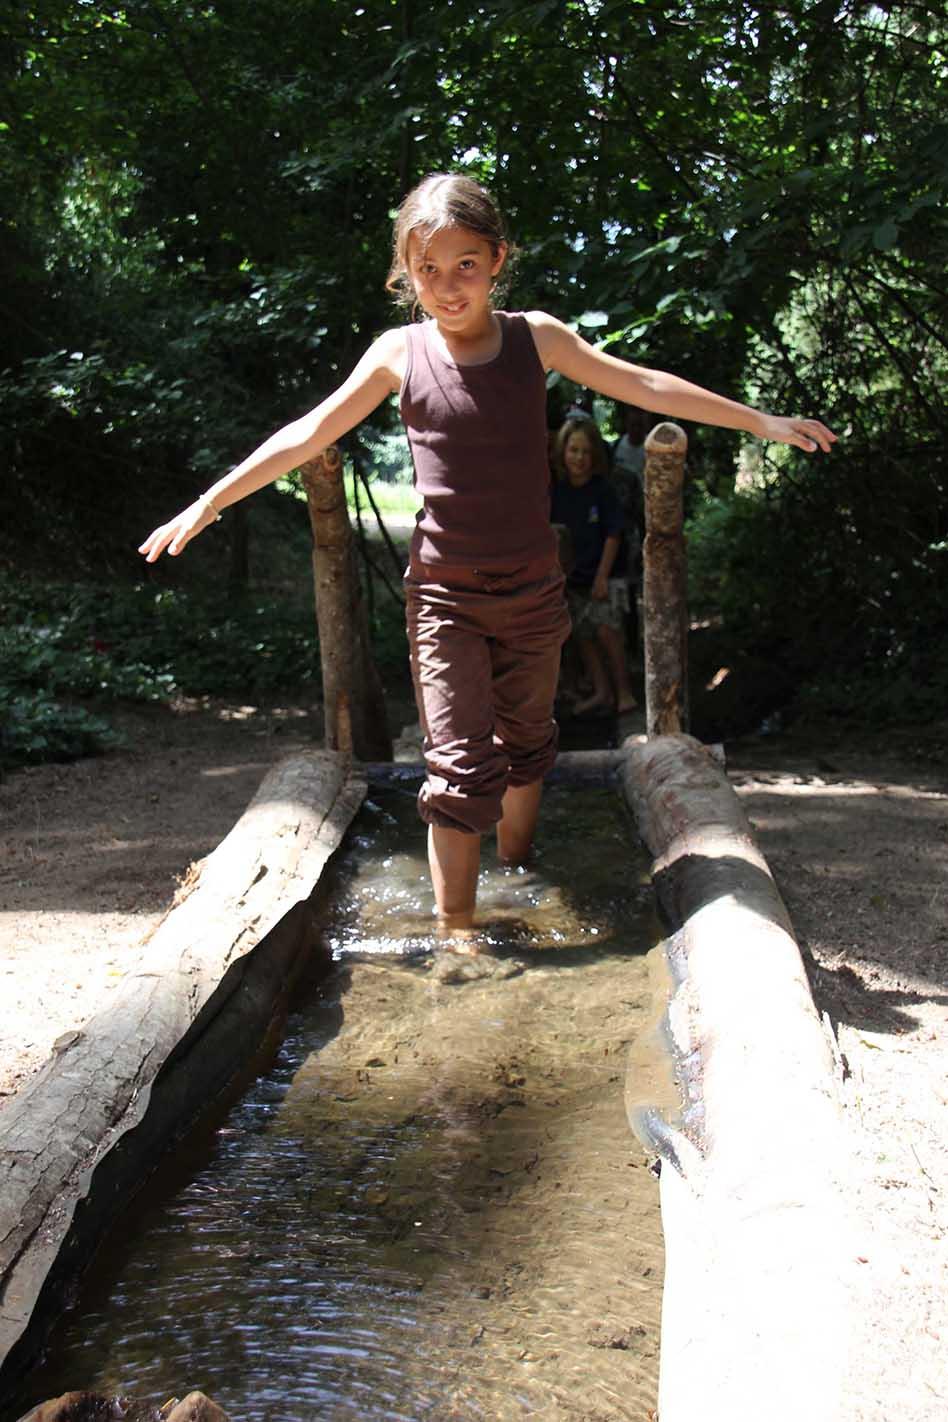 Camina_descalç_Area_aigua (1)